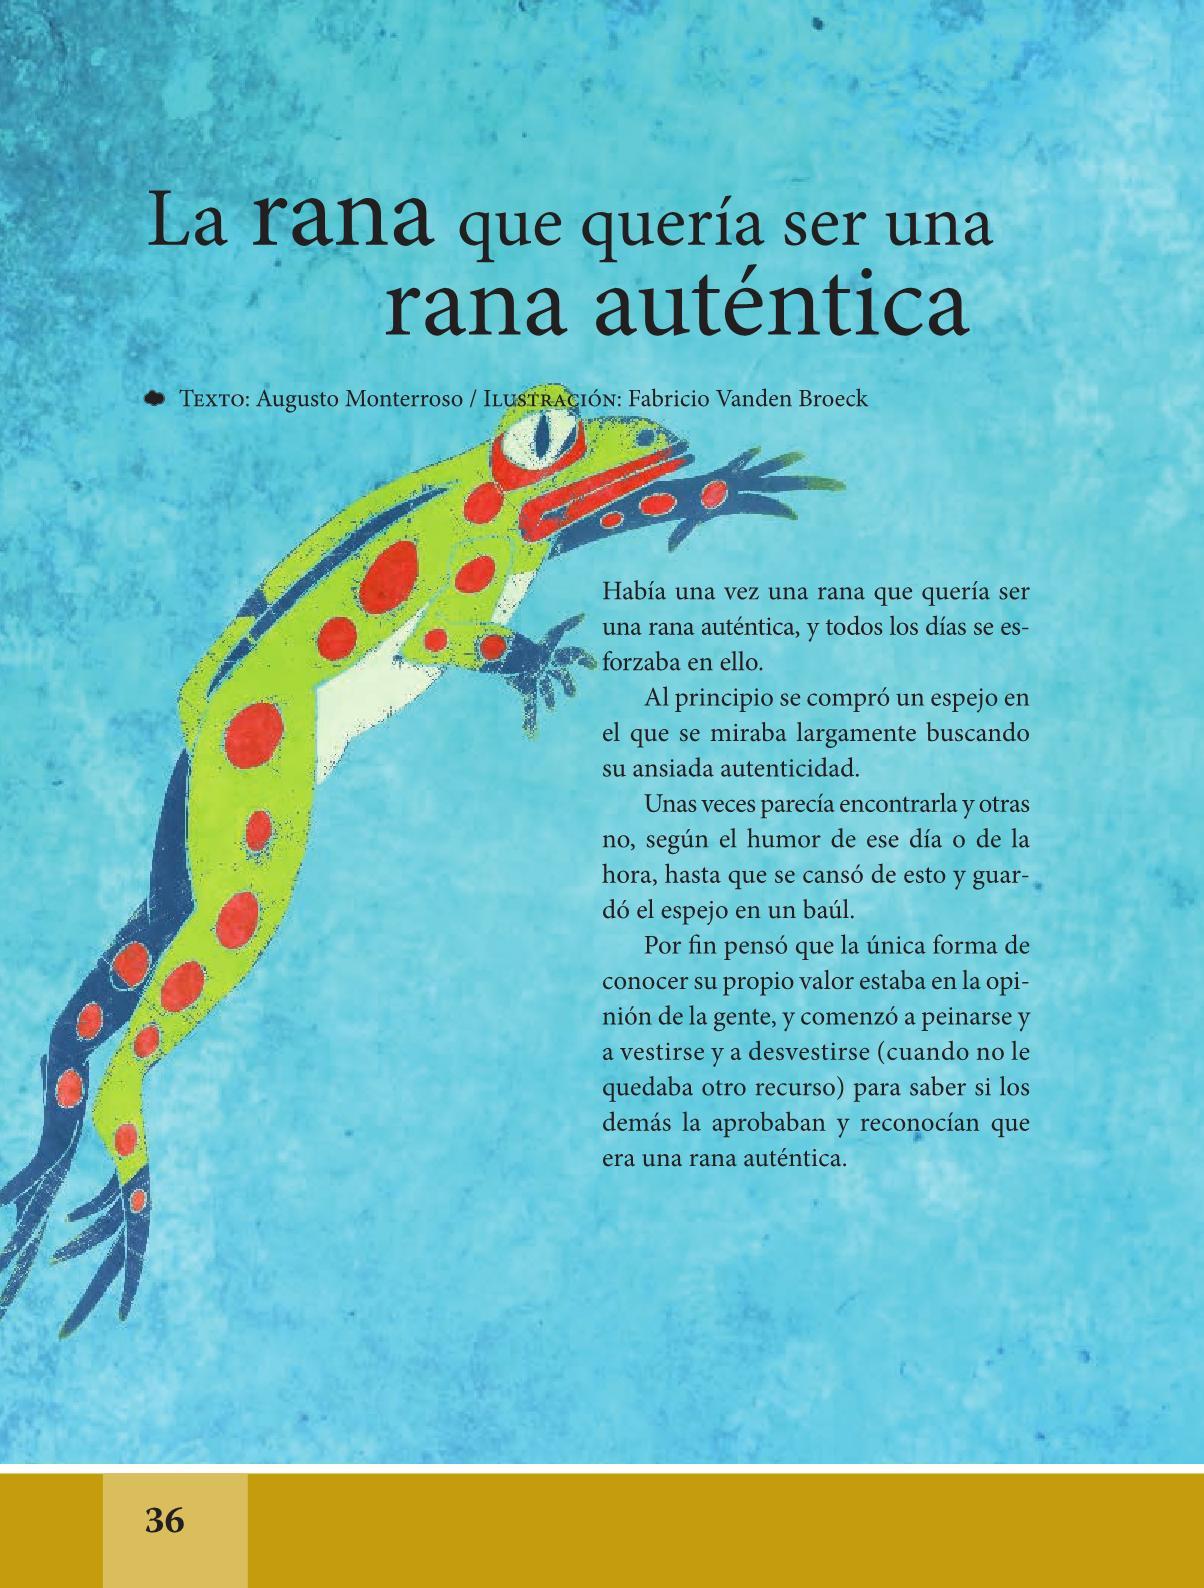 Espa ol libro de lectura sexto grado 2016 2017 online for Espanol lecturas cuarto grado 1993